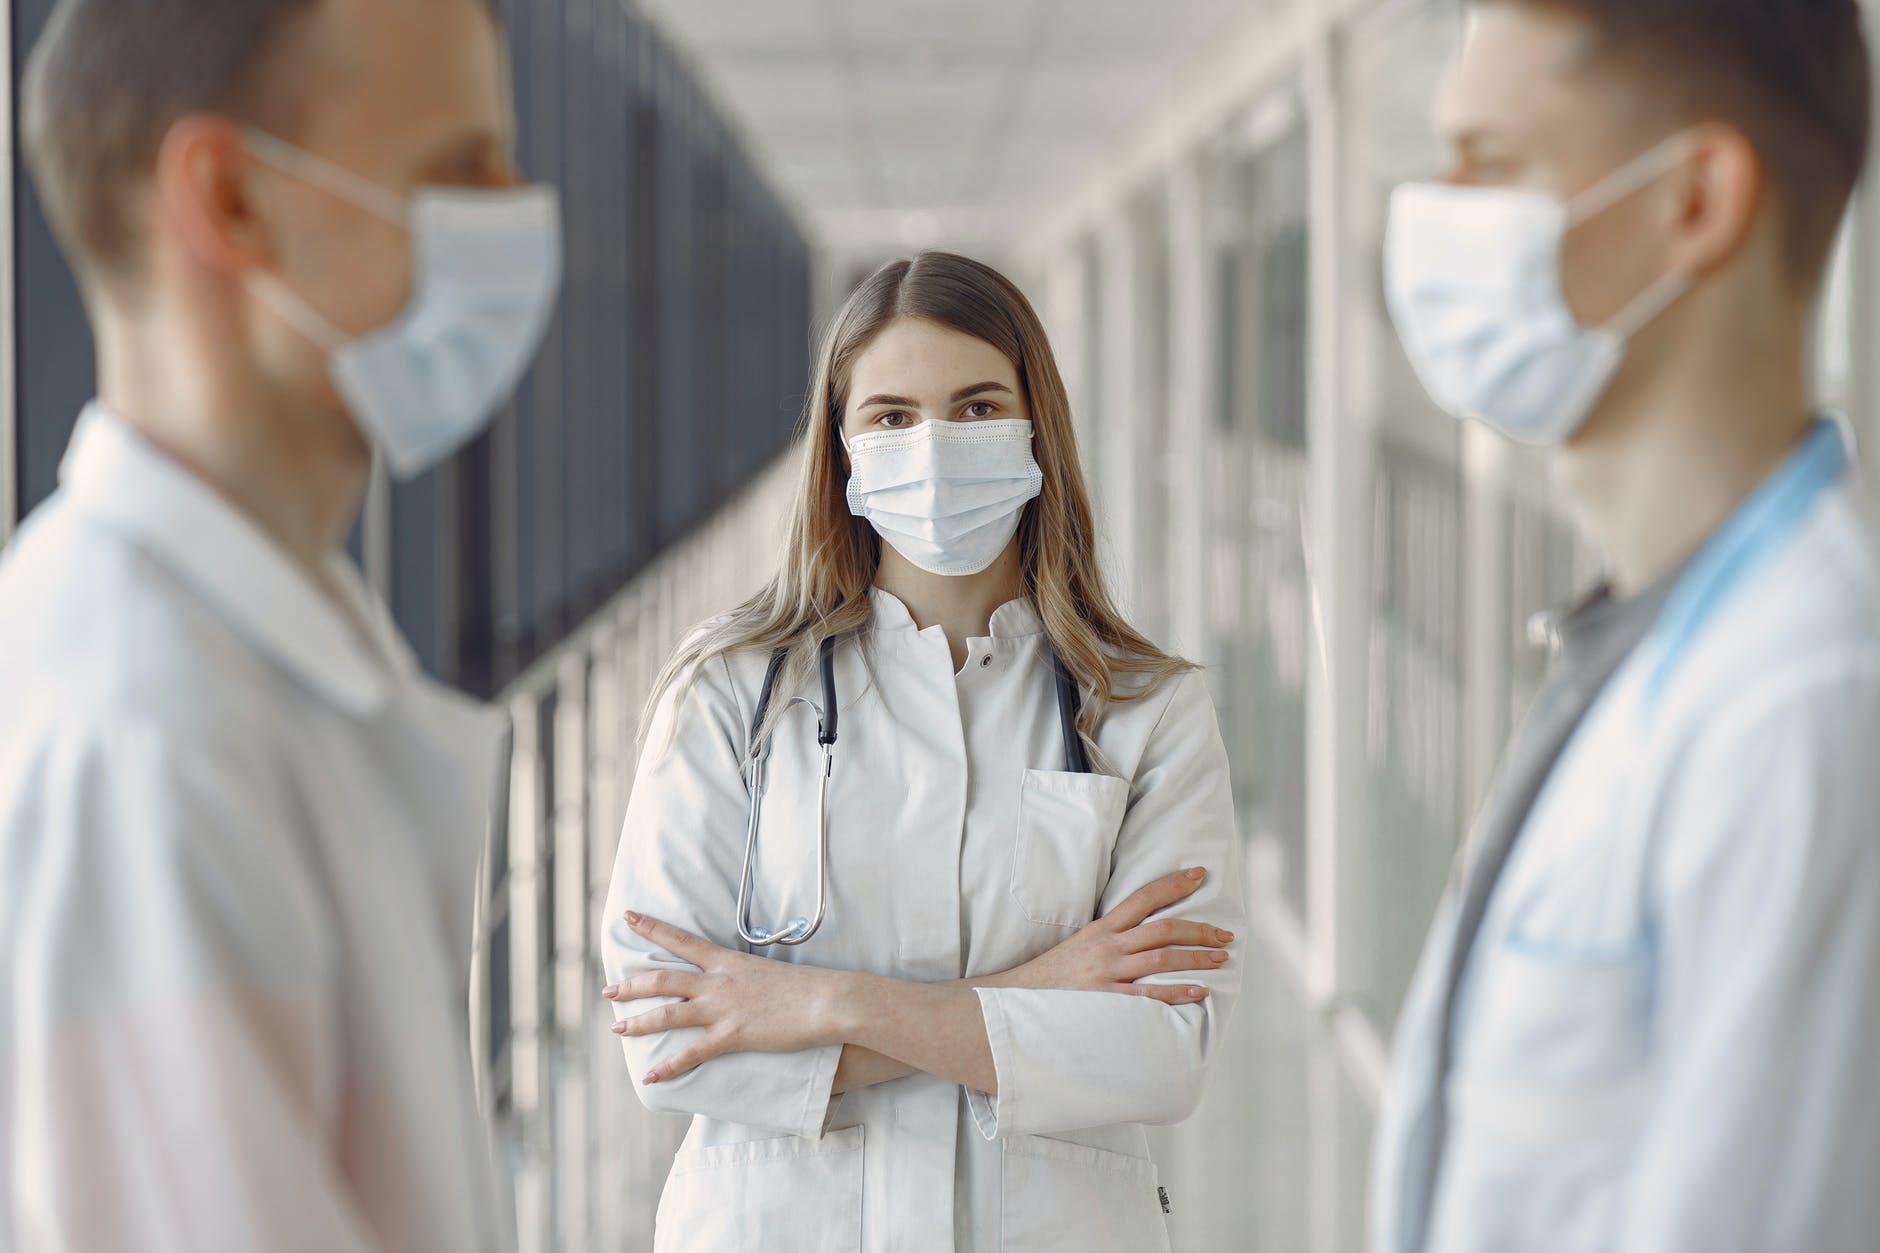 Controle Financeiro Na Atividade Médica - Auster Inteligência Contábil